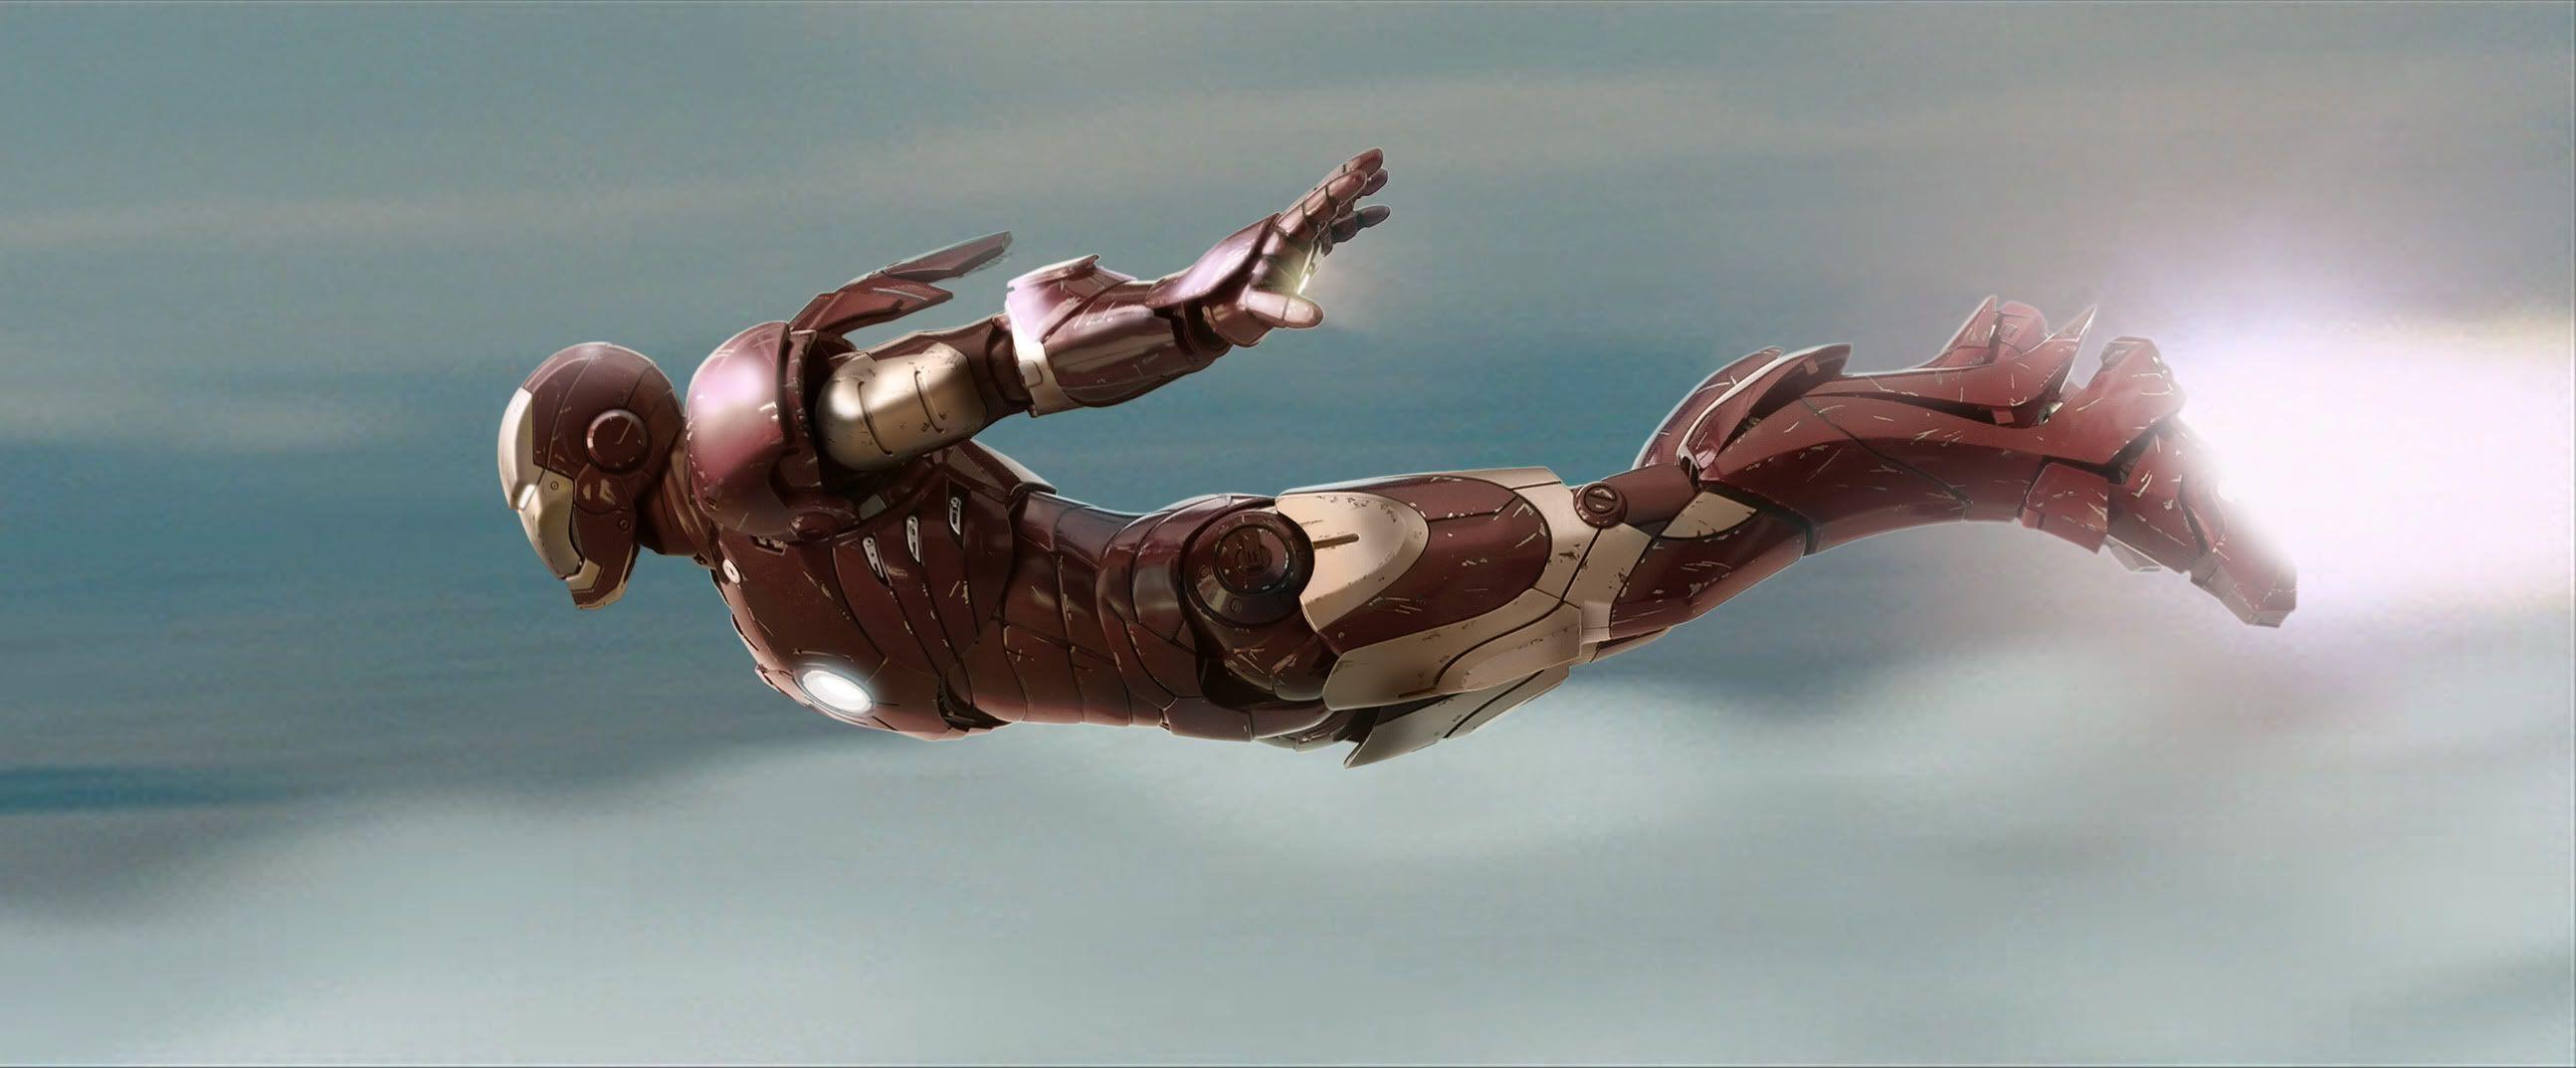 Uncategorized Iron Man Flying iron man flying pesquisa google to illustrate pinterest google